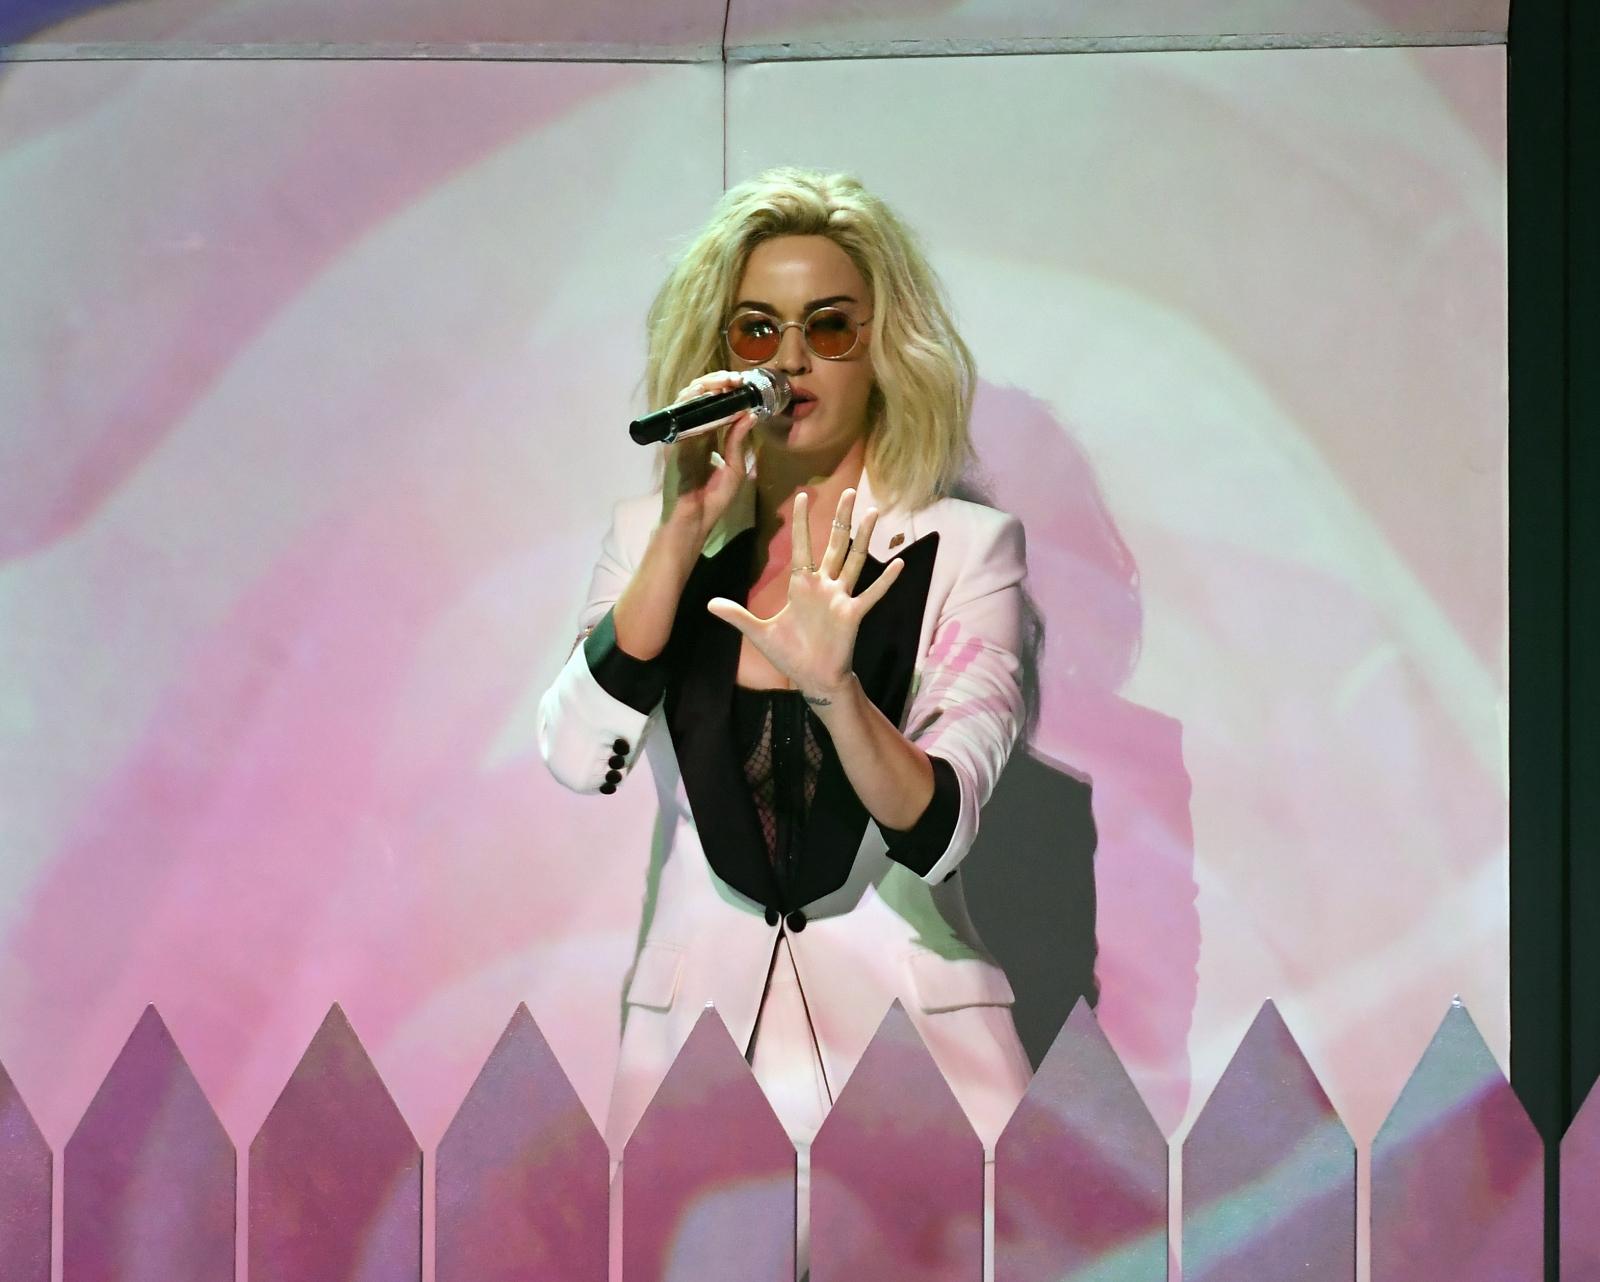 Brits 2017: Katy Perry targets Donald Trump and Theresa May during performance